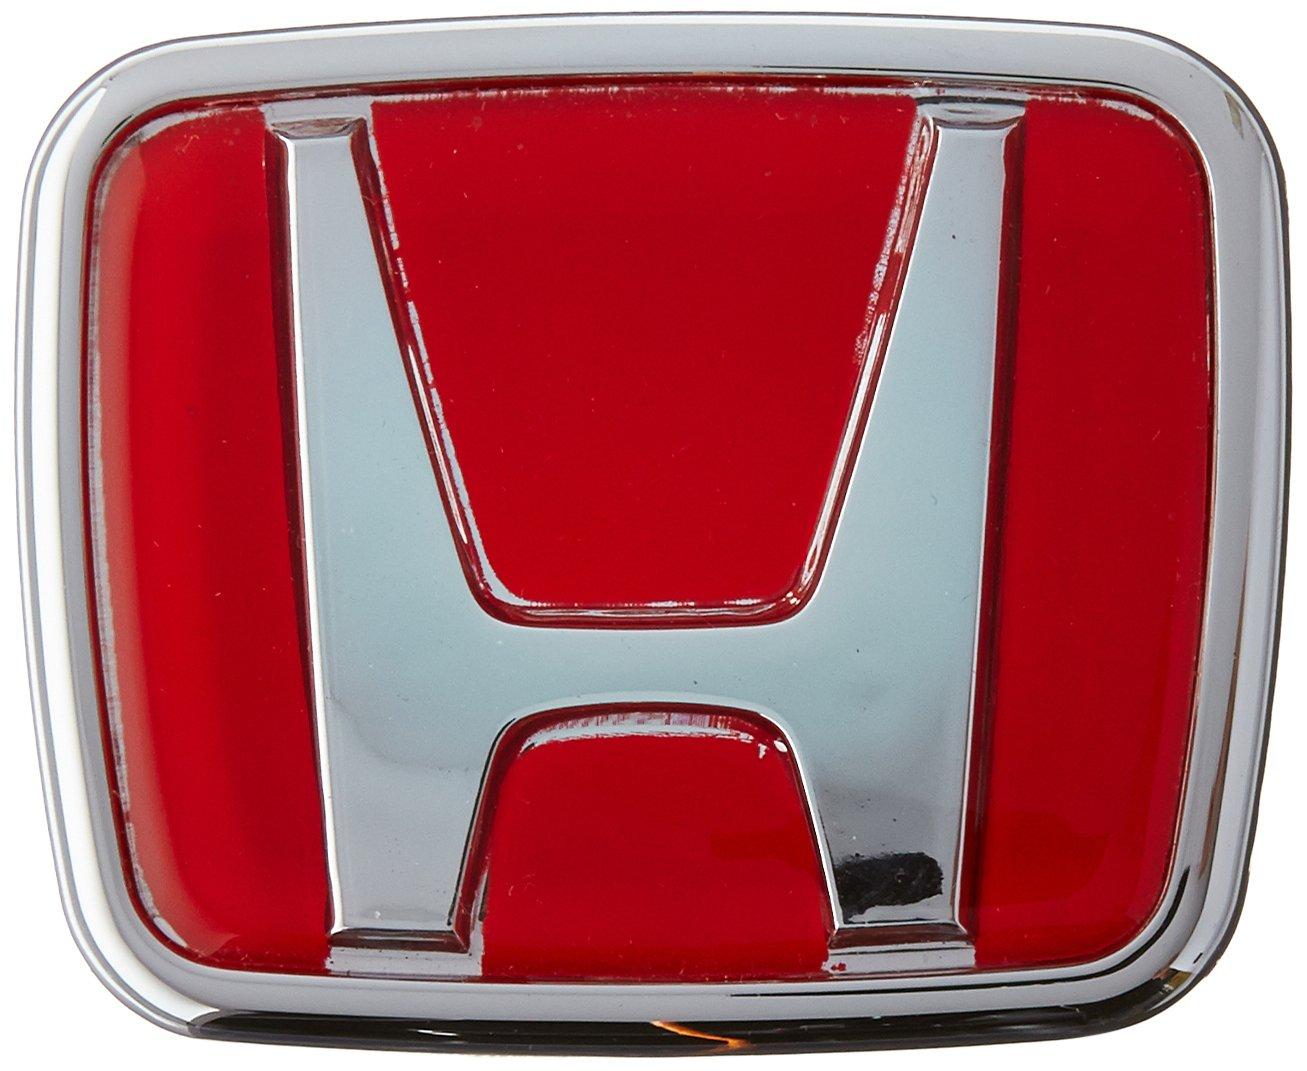 Amazon Generic 88 00 Honda Civic All Model Jdm Style Type R